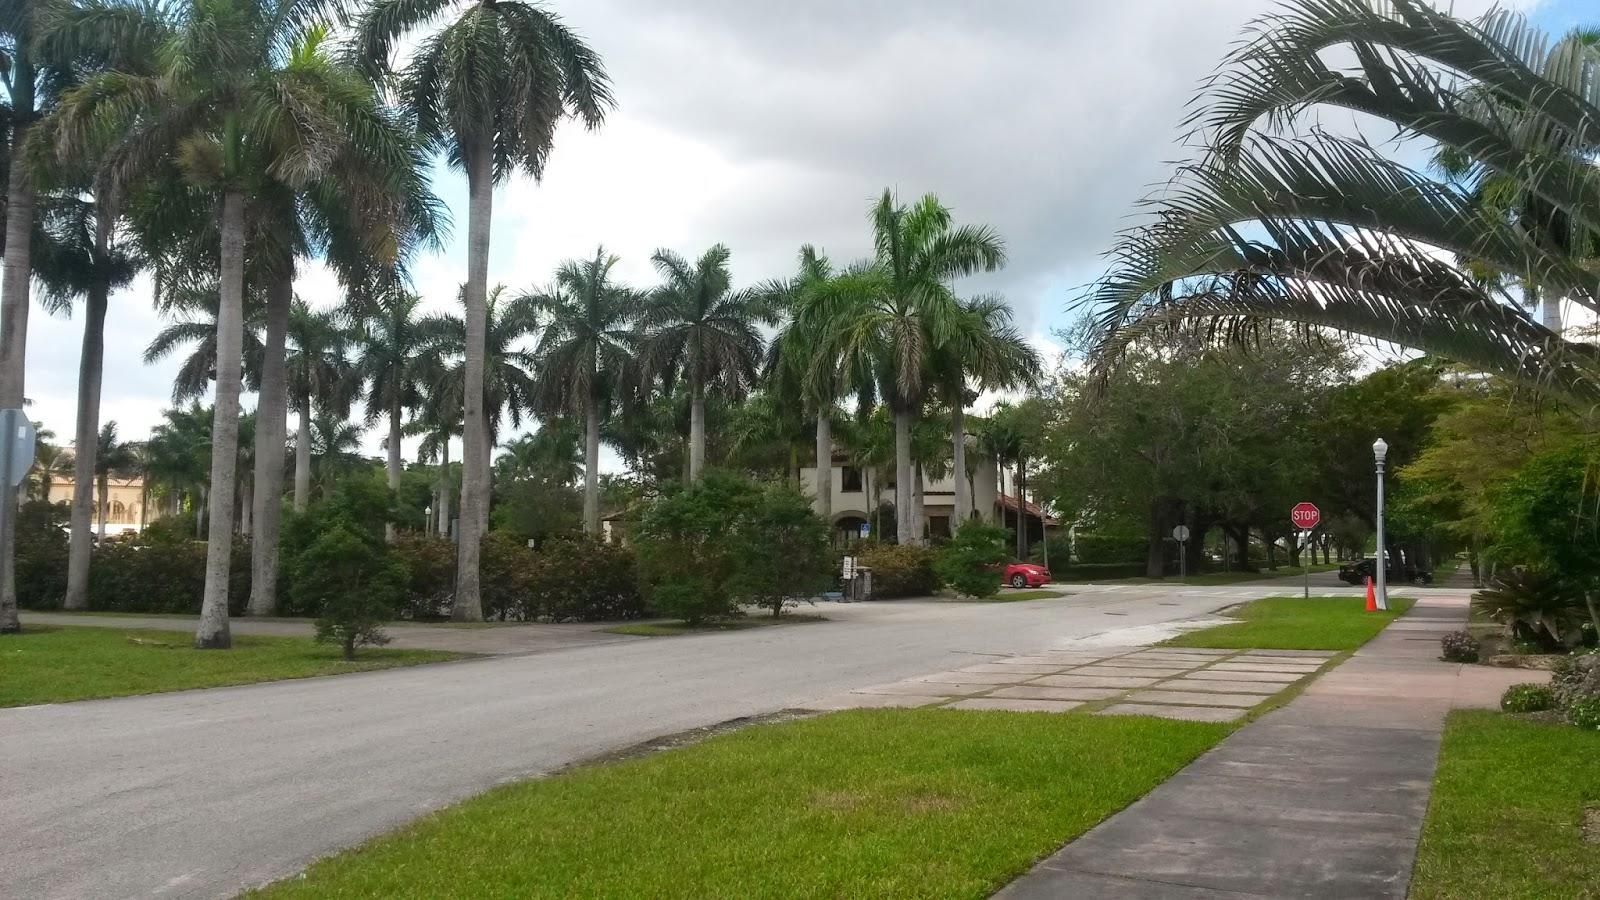 Coral Gables, Miami, Florida, Elisa N, Blog de Viajes, Lifestyle, Travel